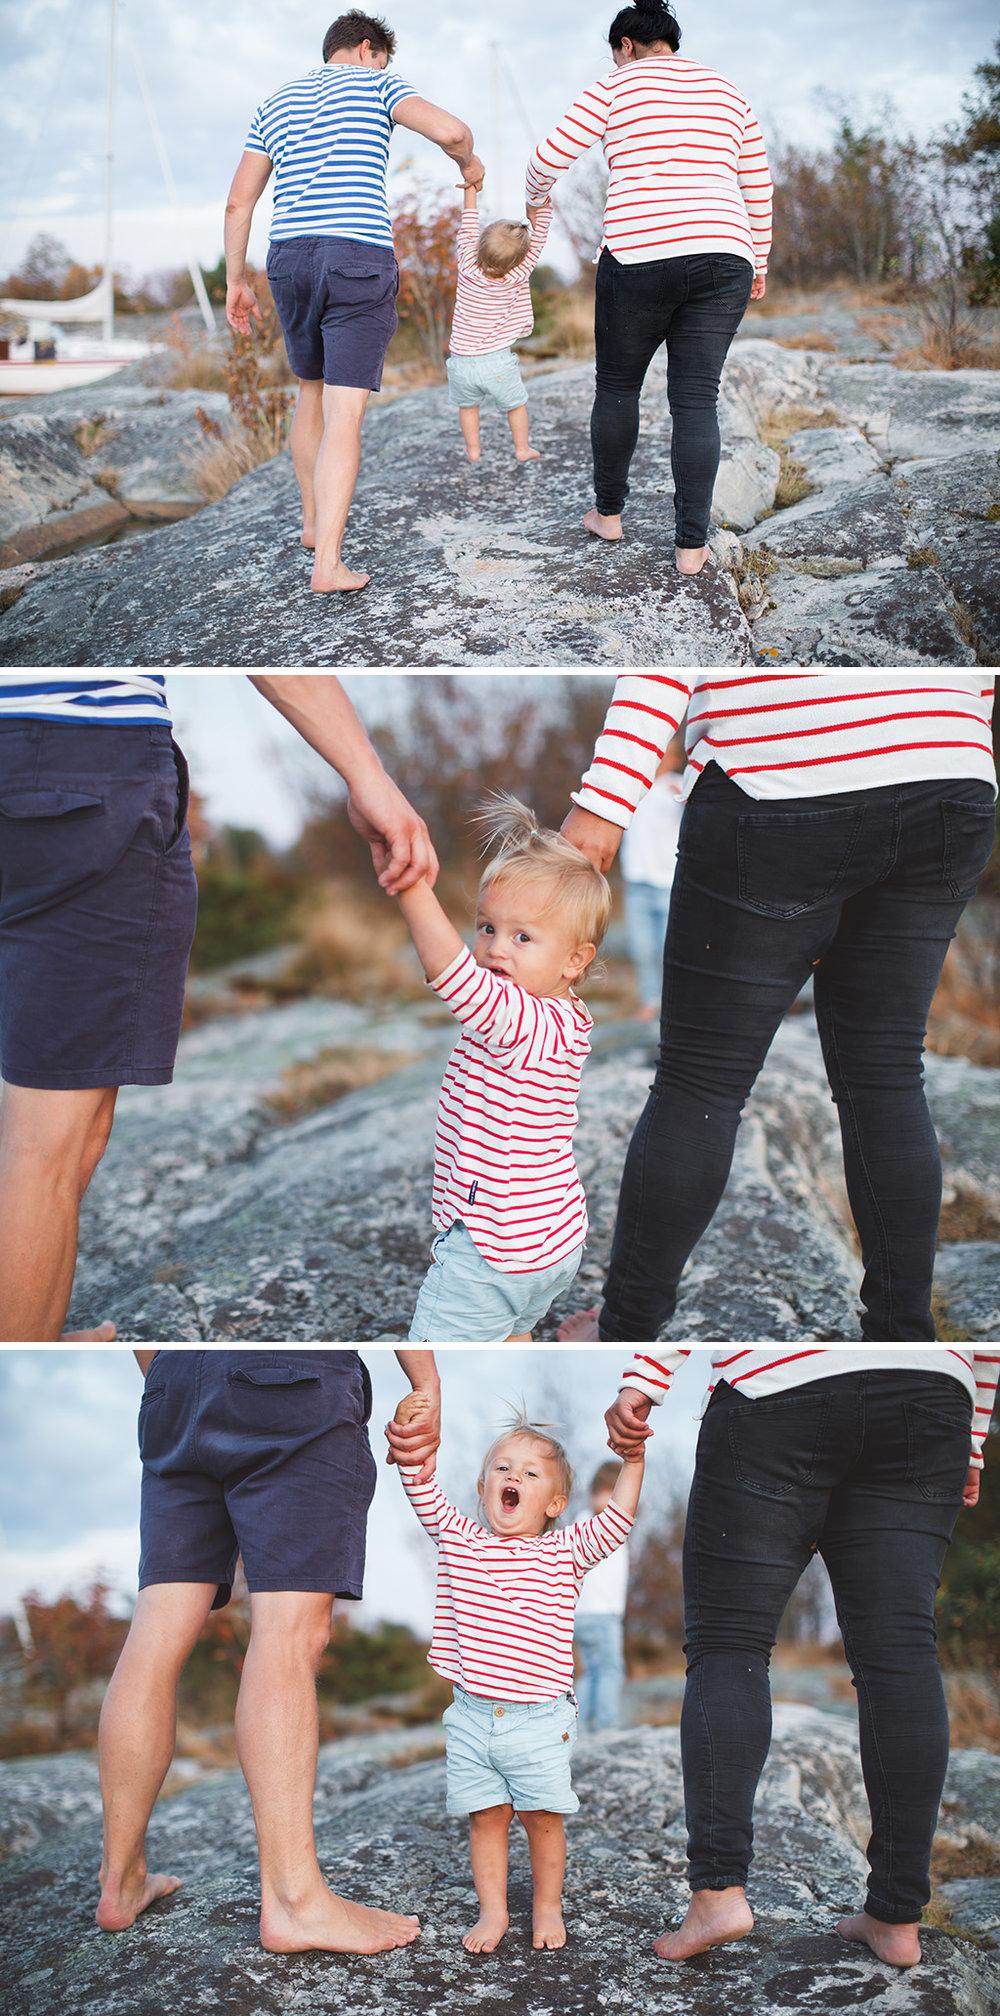 Familjefotografering-Stockholms_Skargard_6.jpg